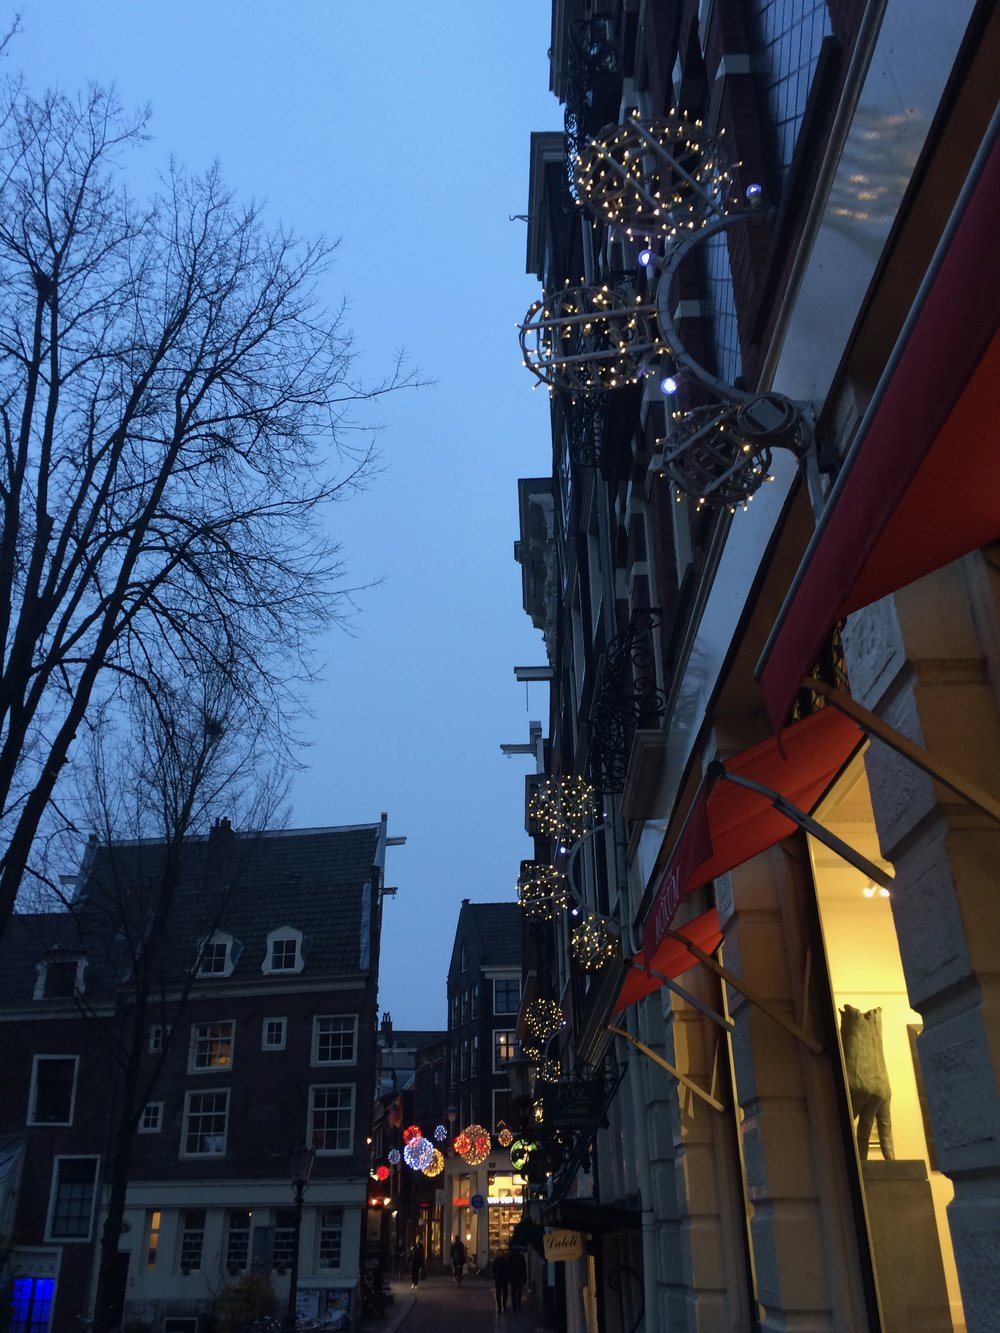 Wanderign in Amsterdam